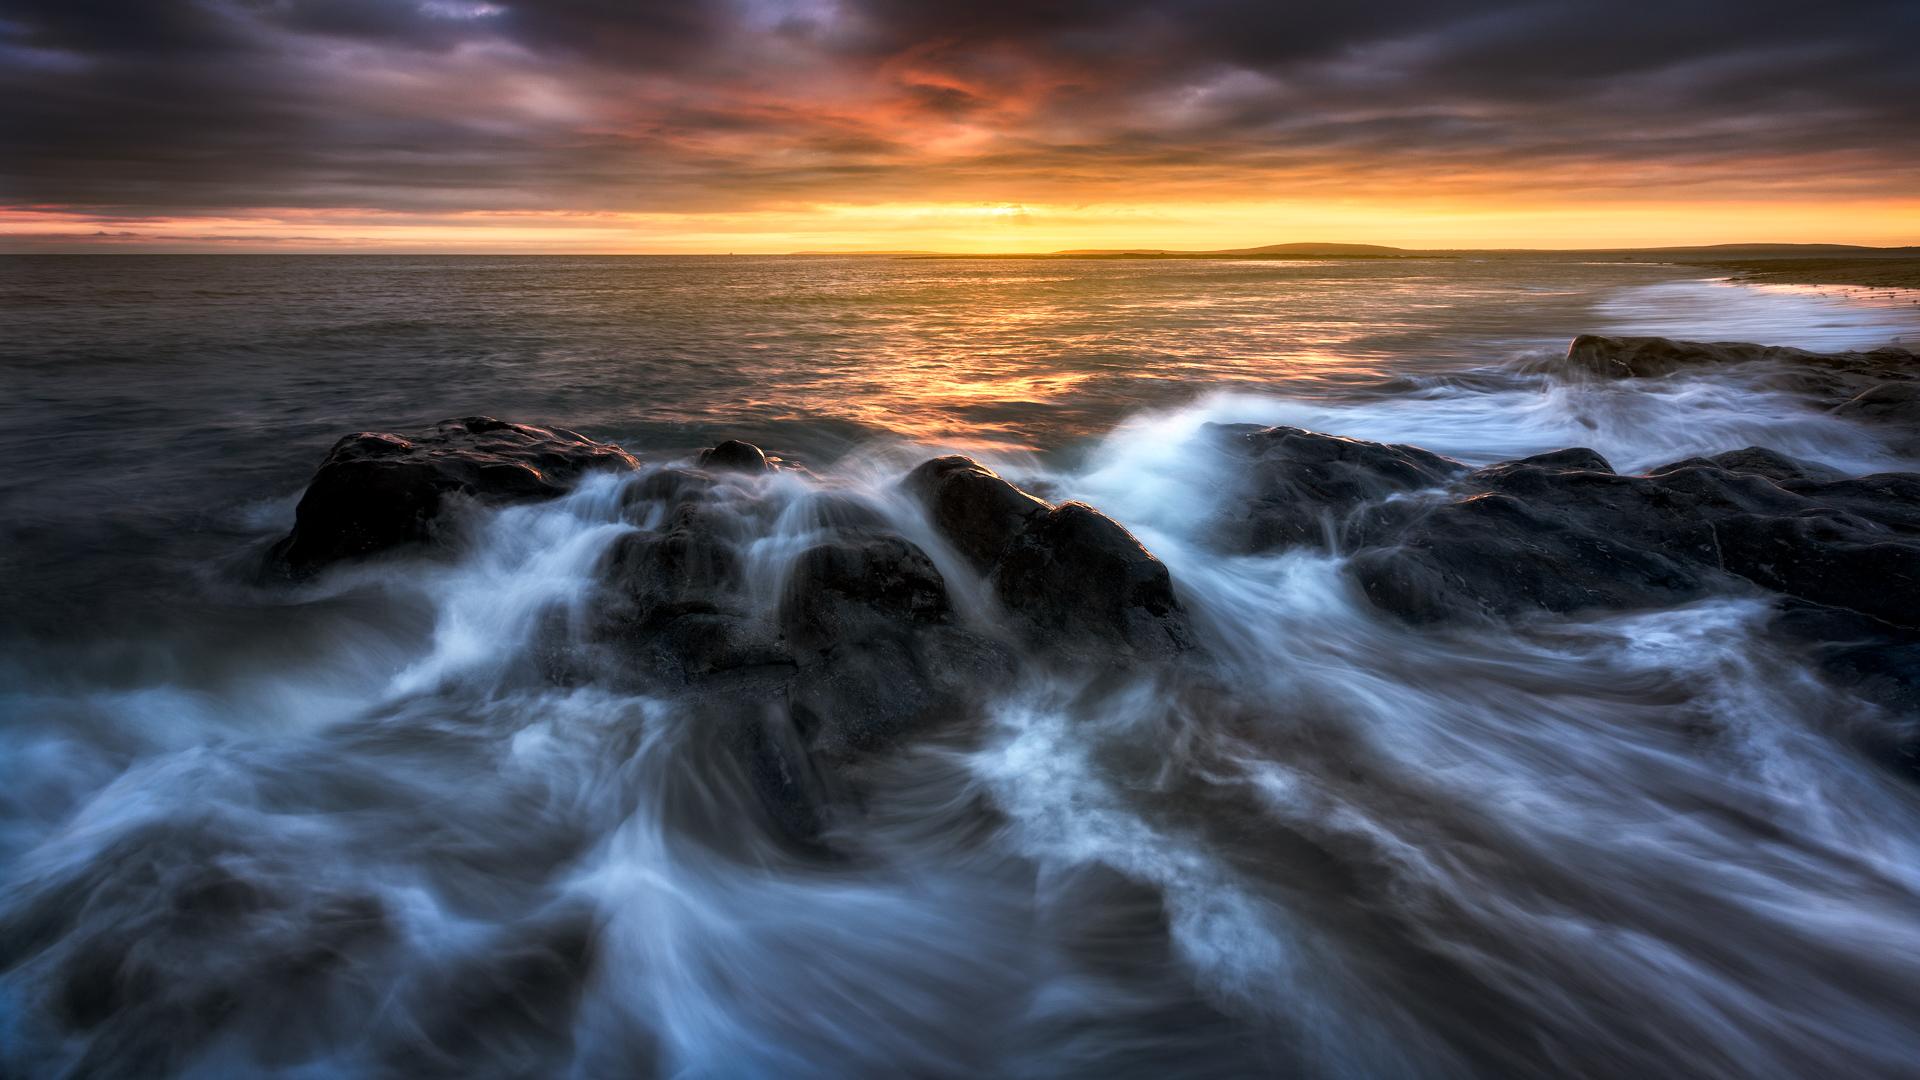 landscape_photography_ballybunion_kerry_ireland_by_greengraf_photography.jpg